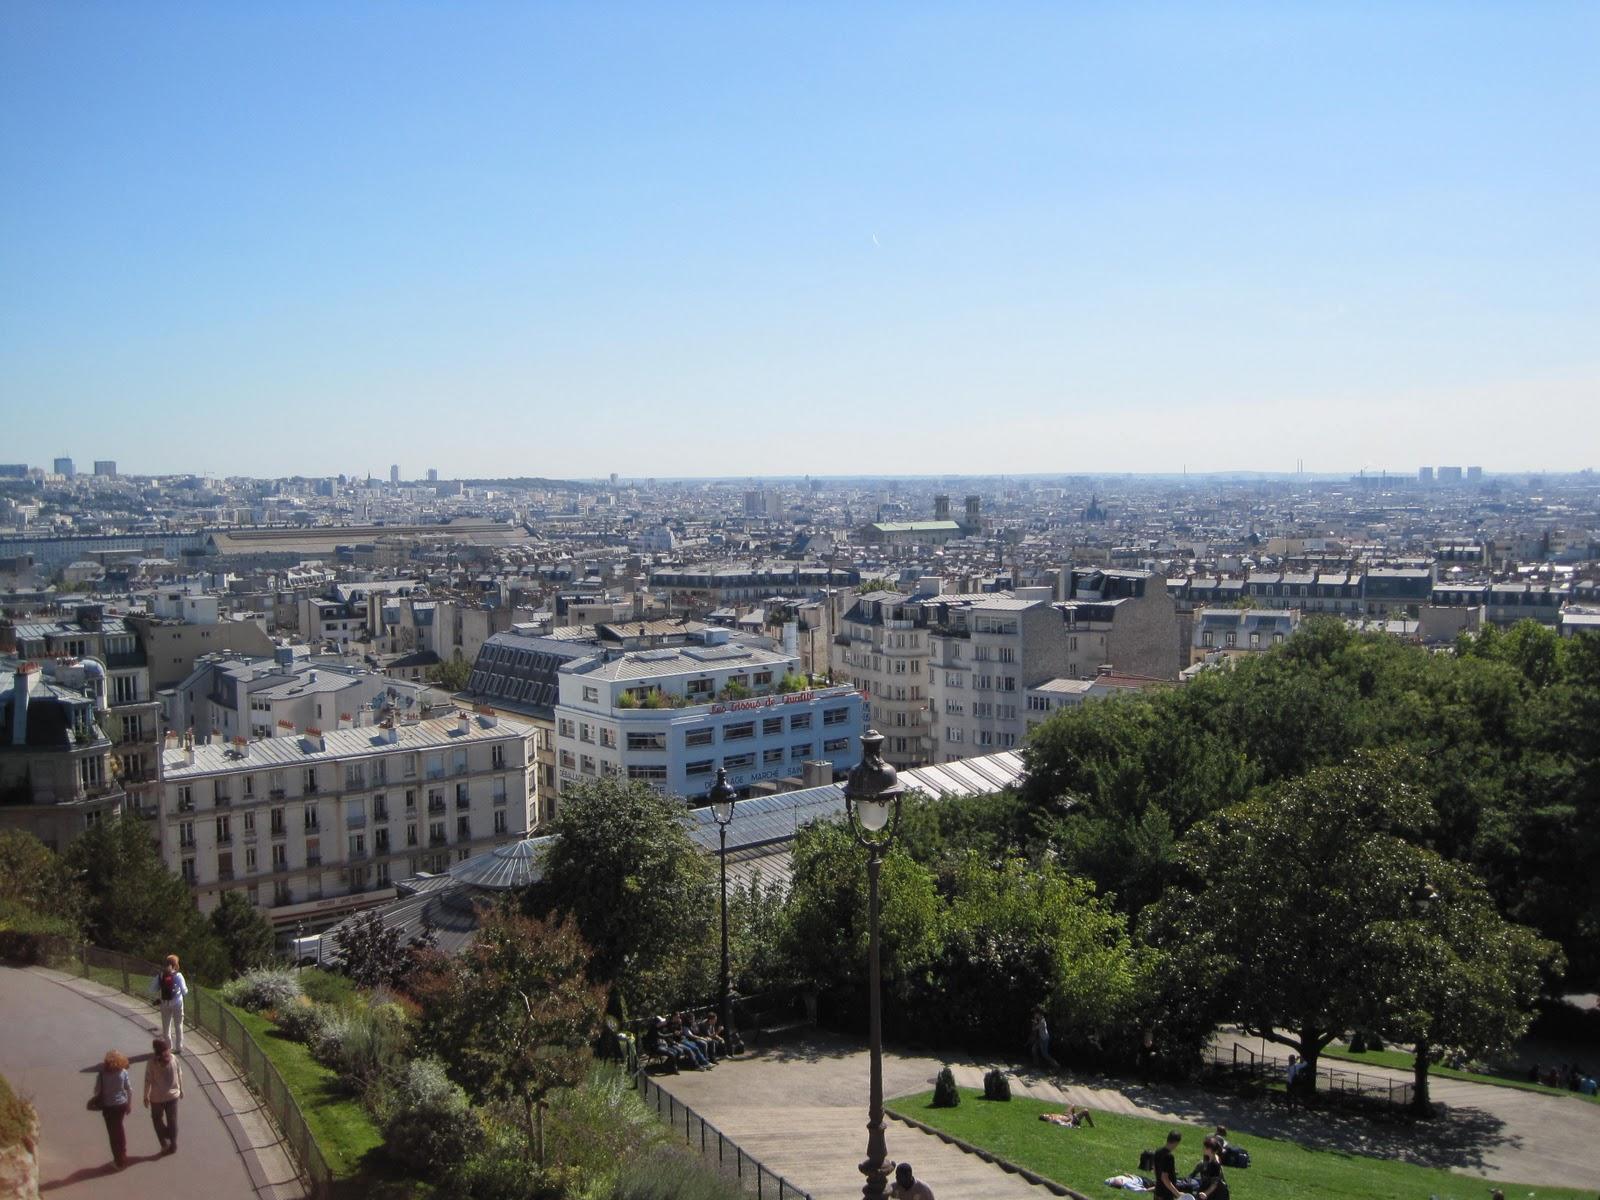 http://3.bp.blogspot.com/_4WCa7nfXMY0/TJ23ROfhlbI/AAAAAAAAAK4/NmuyNnv8cBs/s1600/Aer+Lingus-Paris+020.JPG